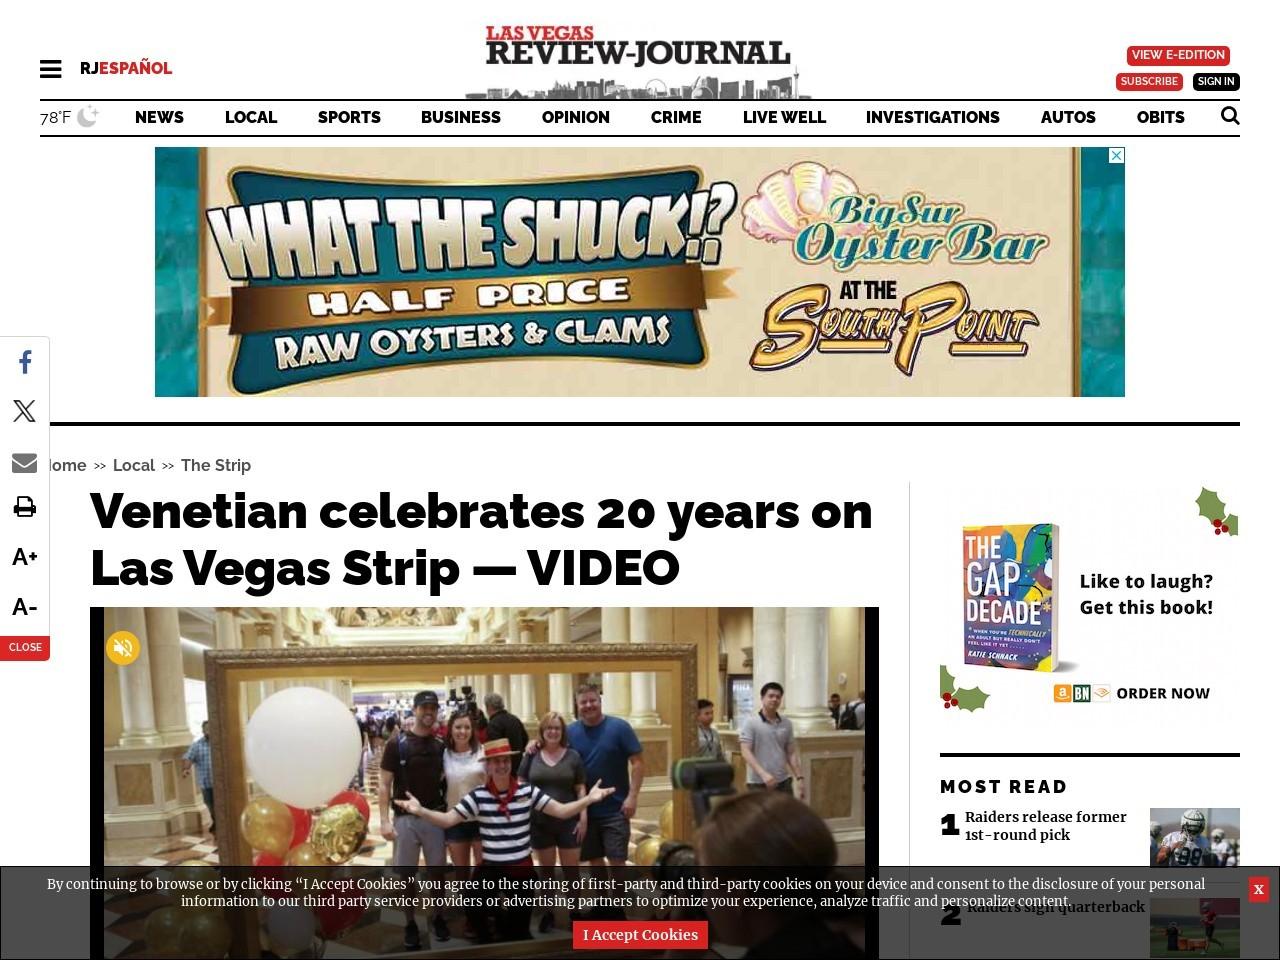 Venetian celebrates 20 years on Las Vegas Strip — VIDEO